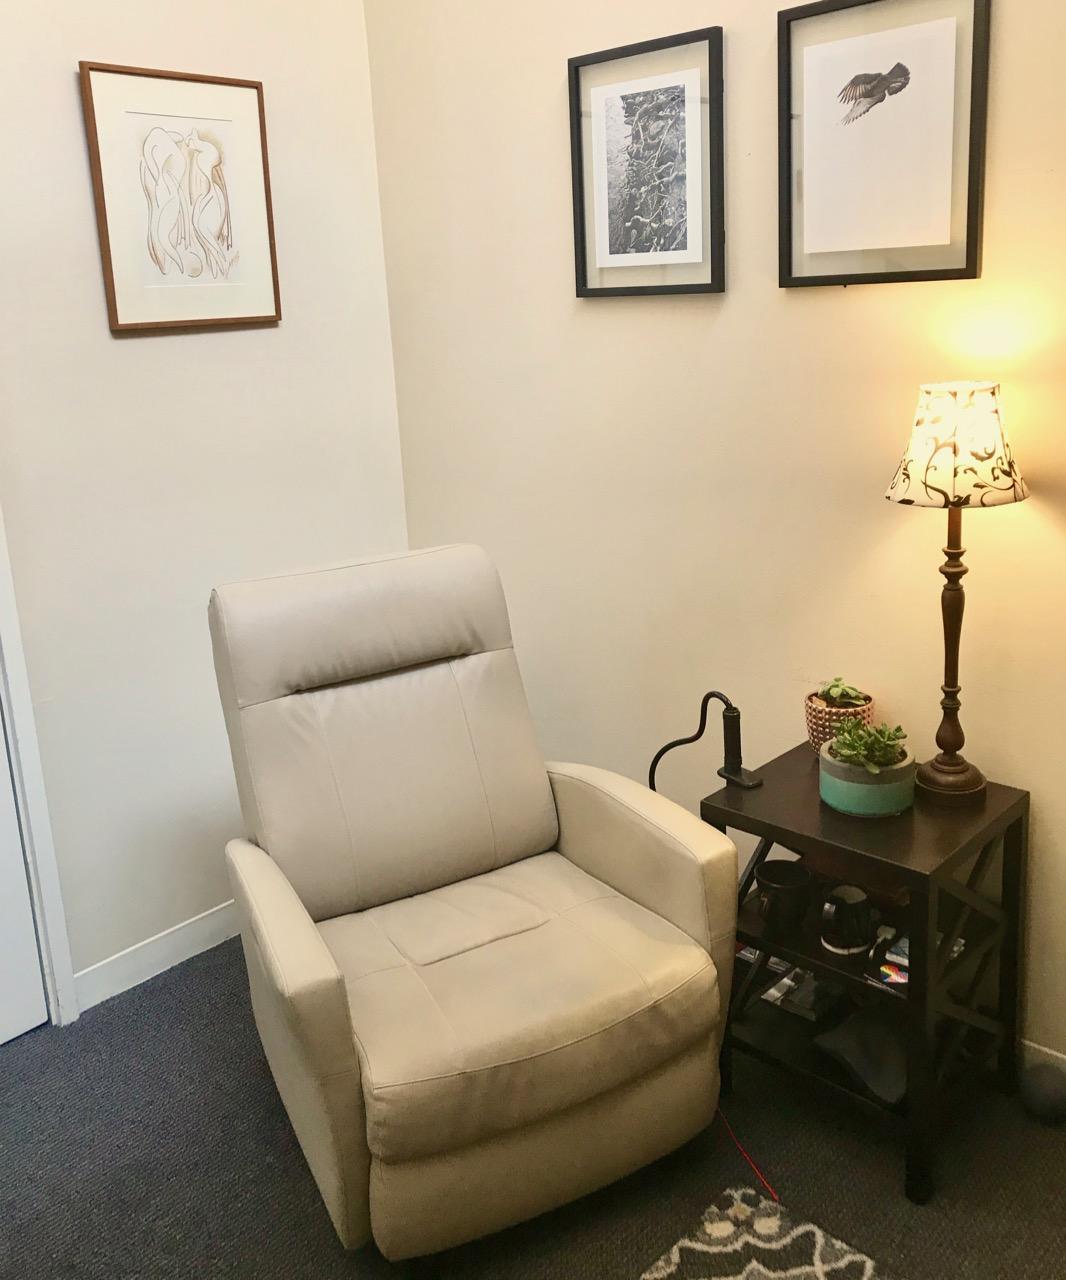 office-chair.jpg